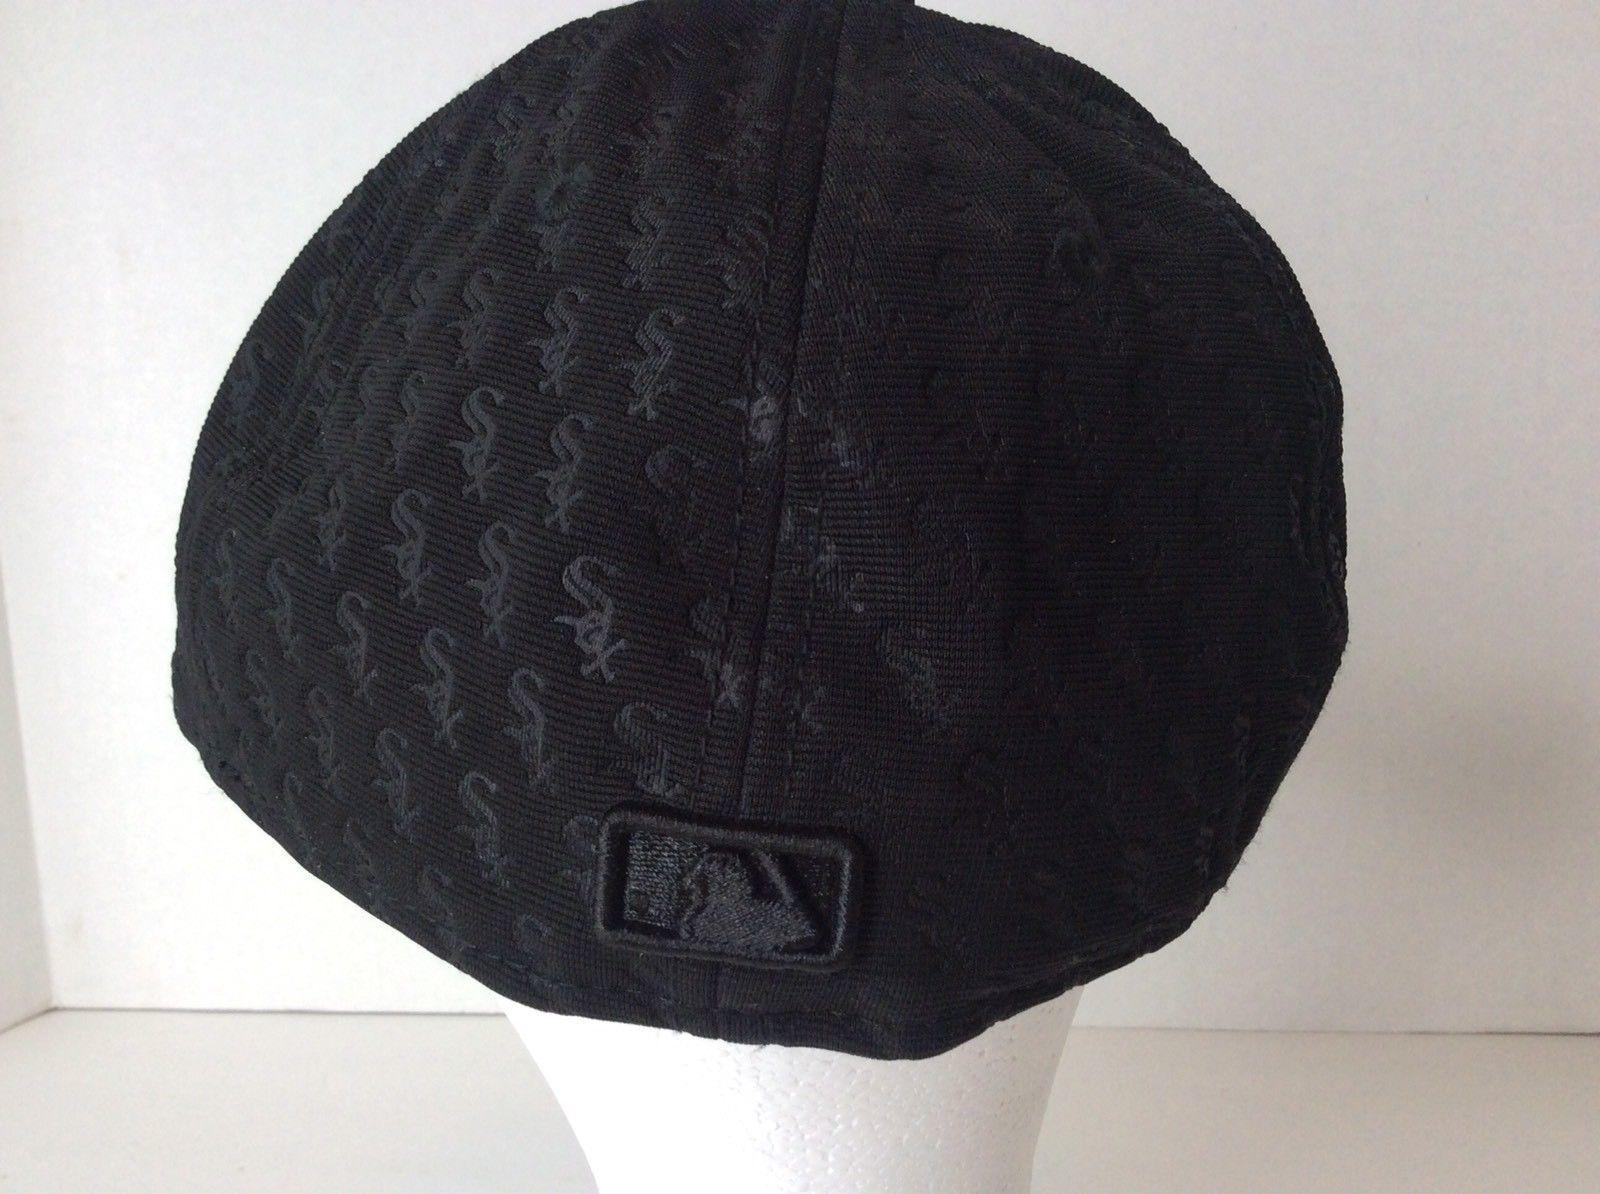 New Era MLB Chicago White Sox All Over Print Black Fitted Baseball Cap Hat SZ 7